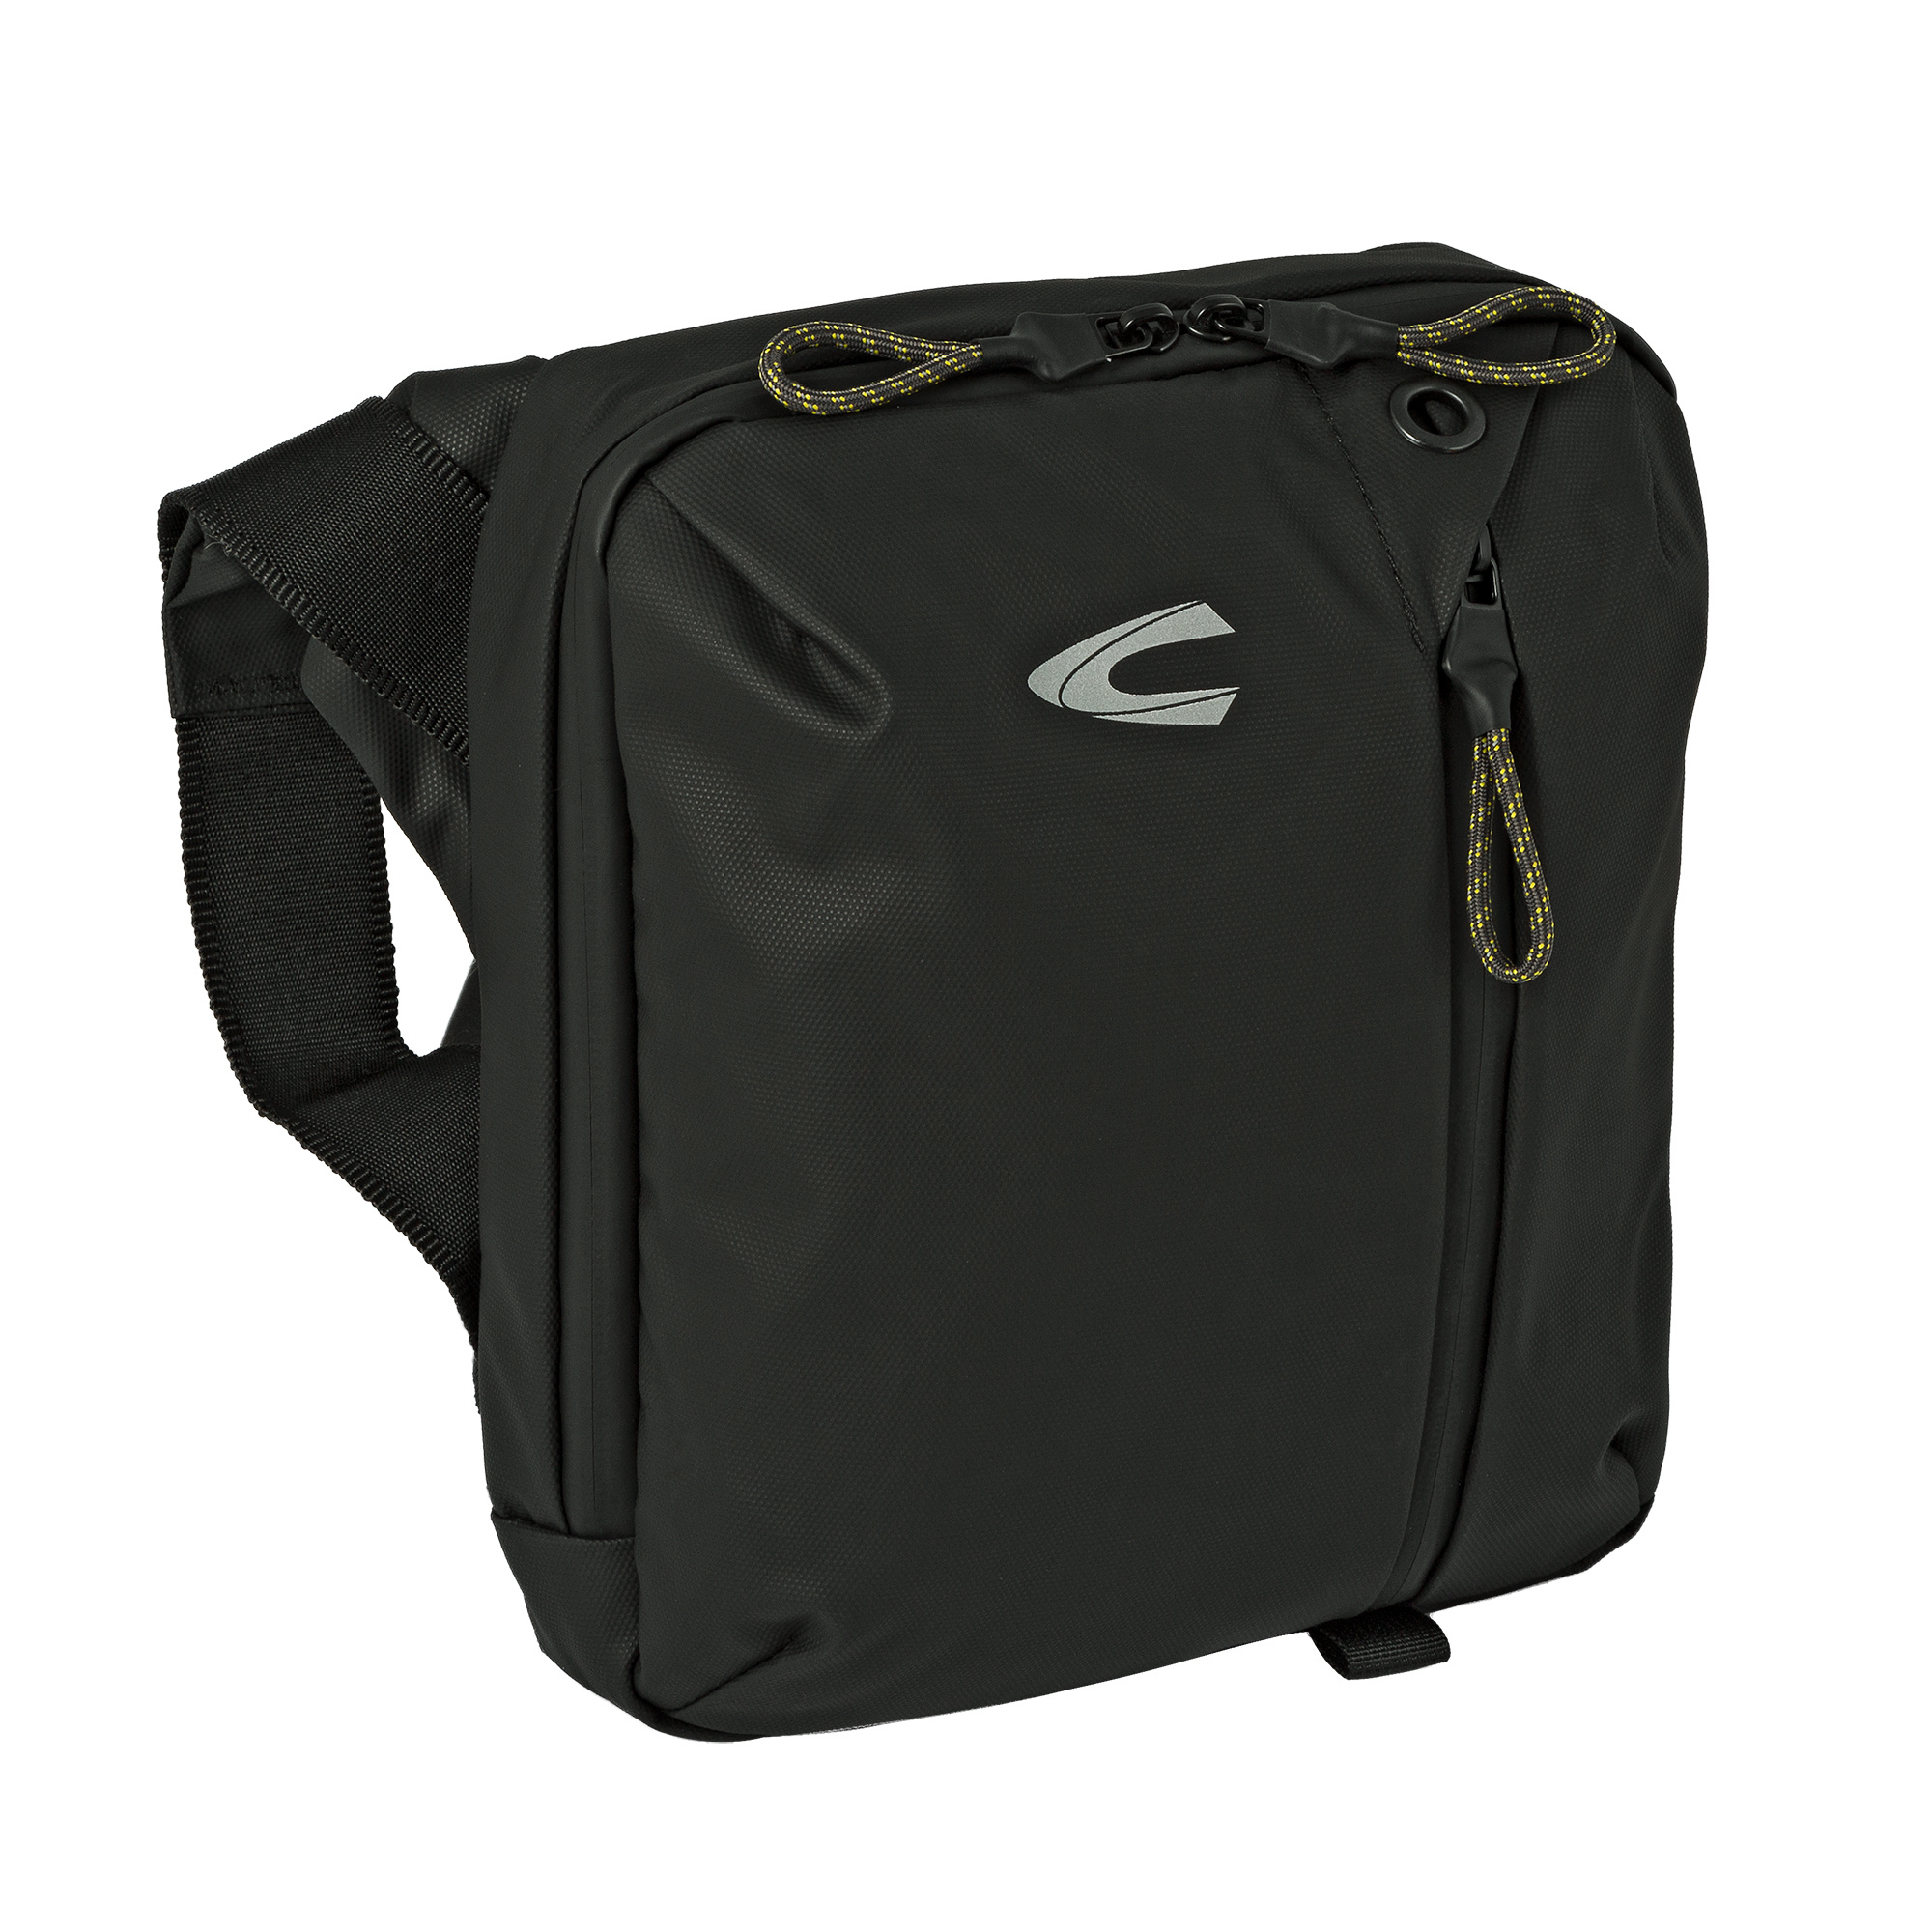 Camel Active Palermo Cross Bag M 306-601 Black